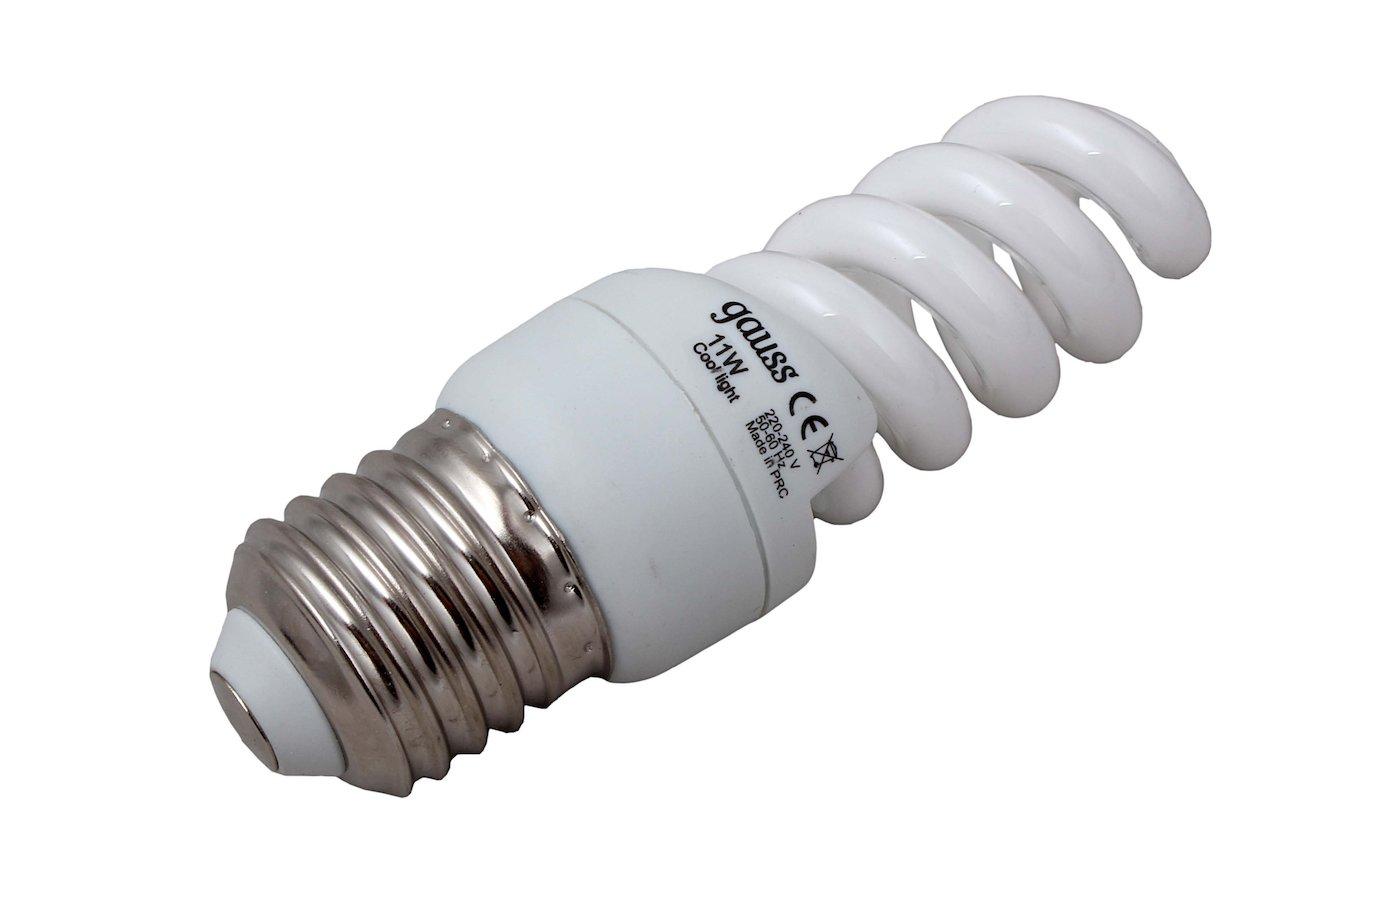 Лампочки энергосберегающие Gauss Spiral T2 11W 4200K E27